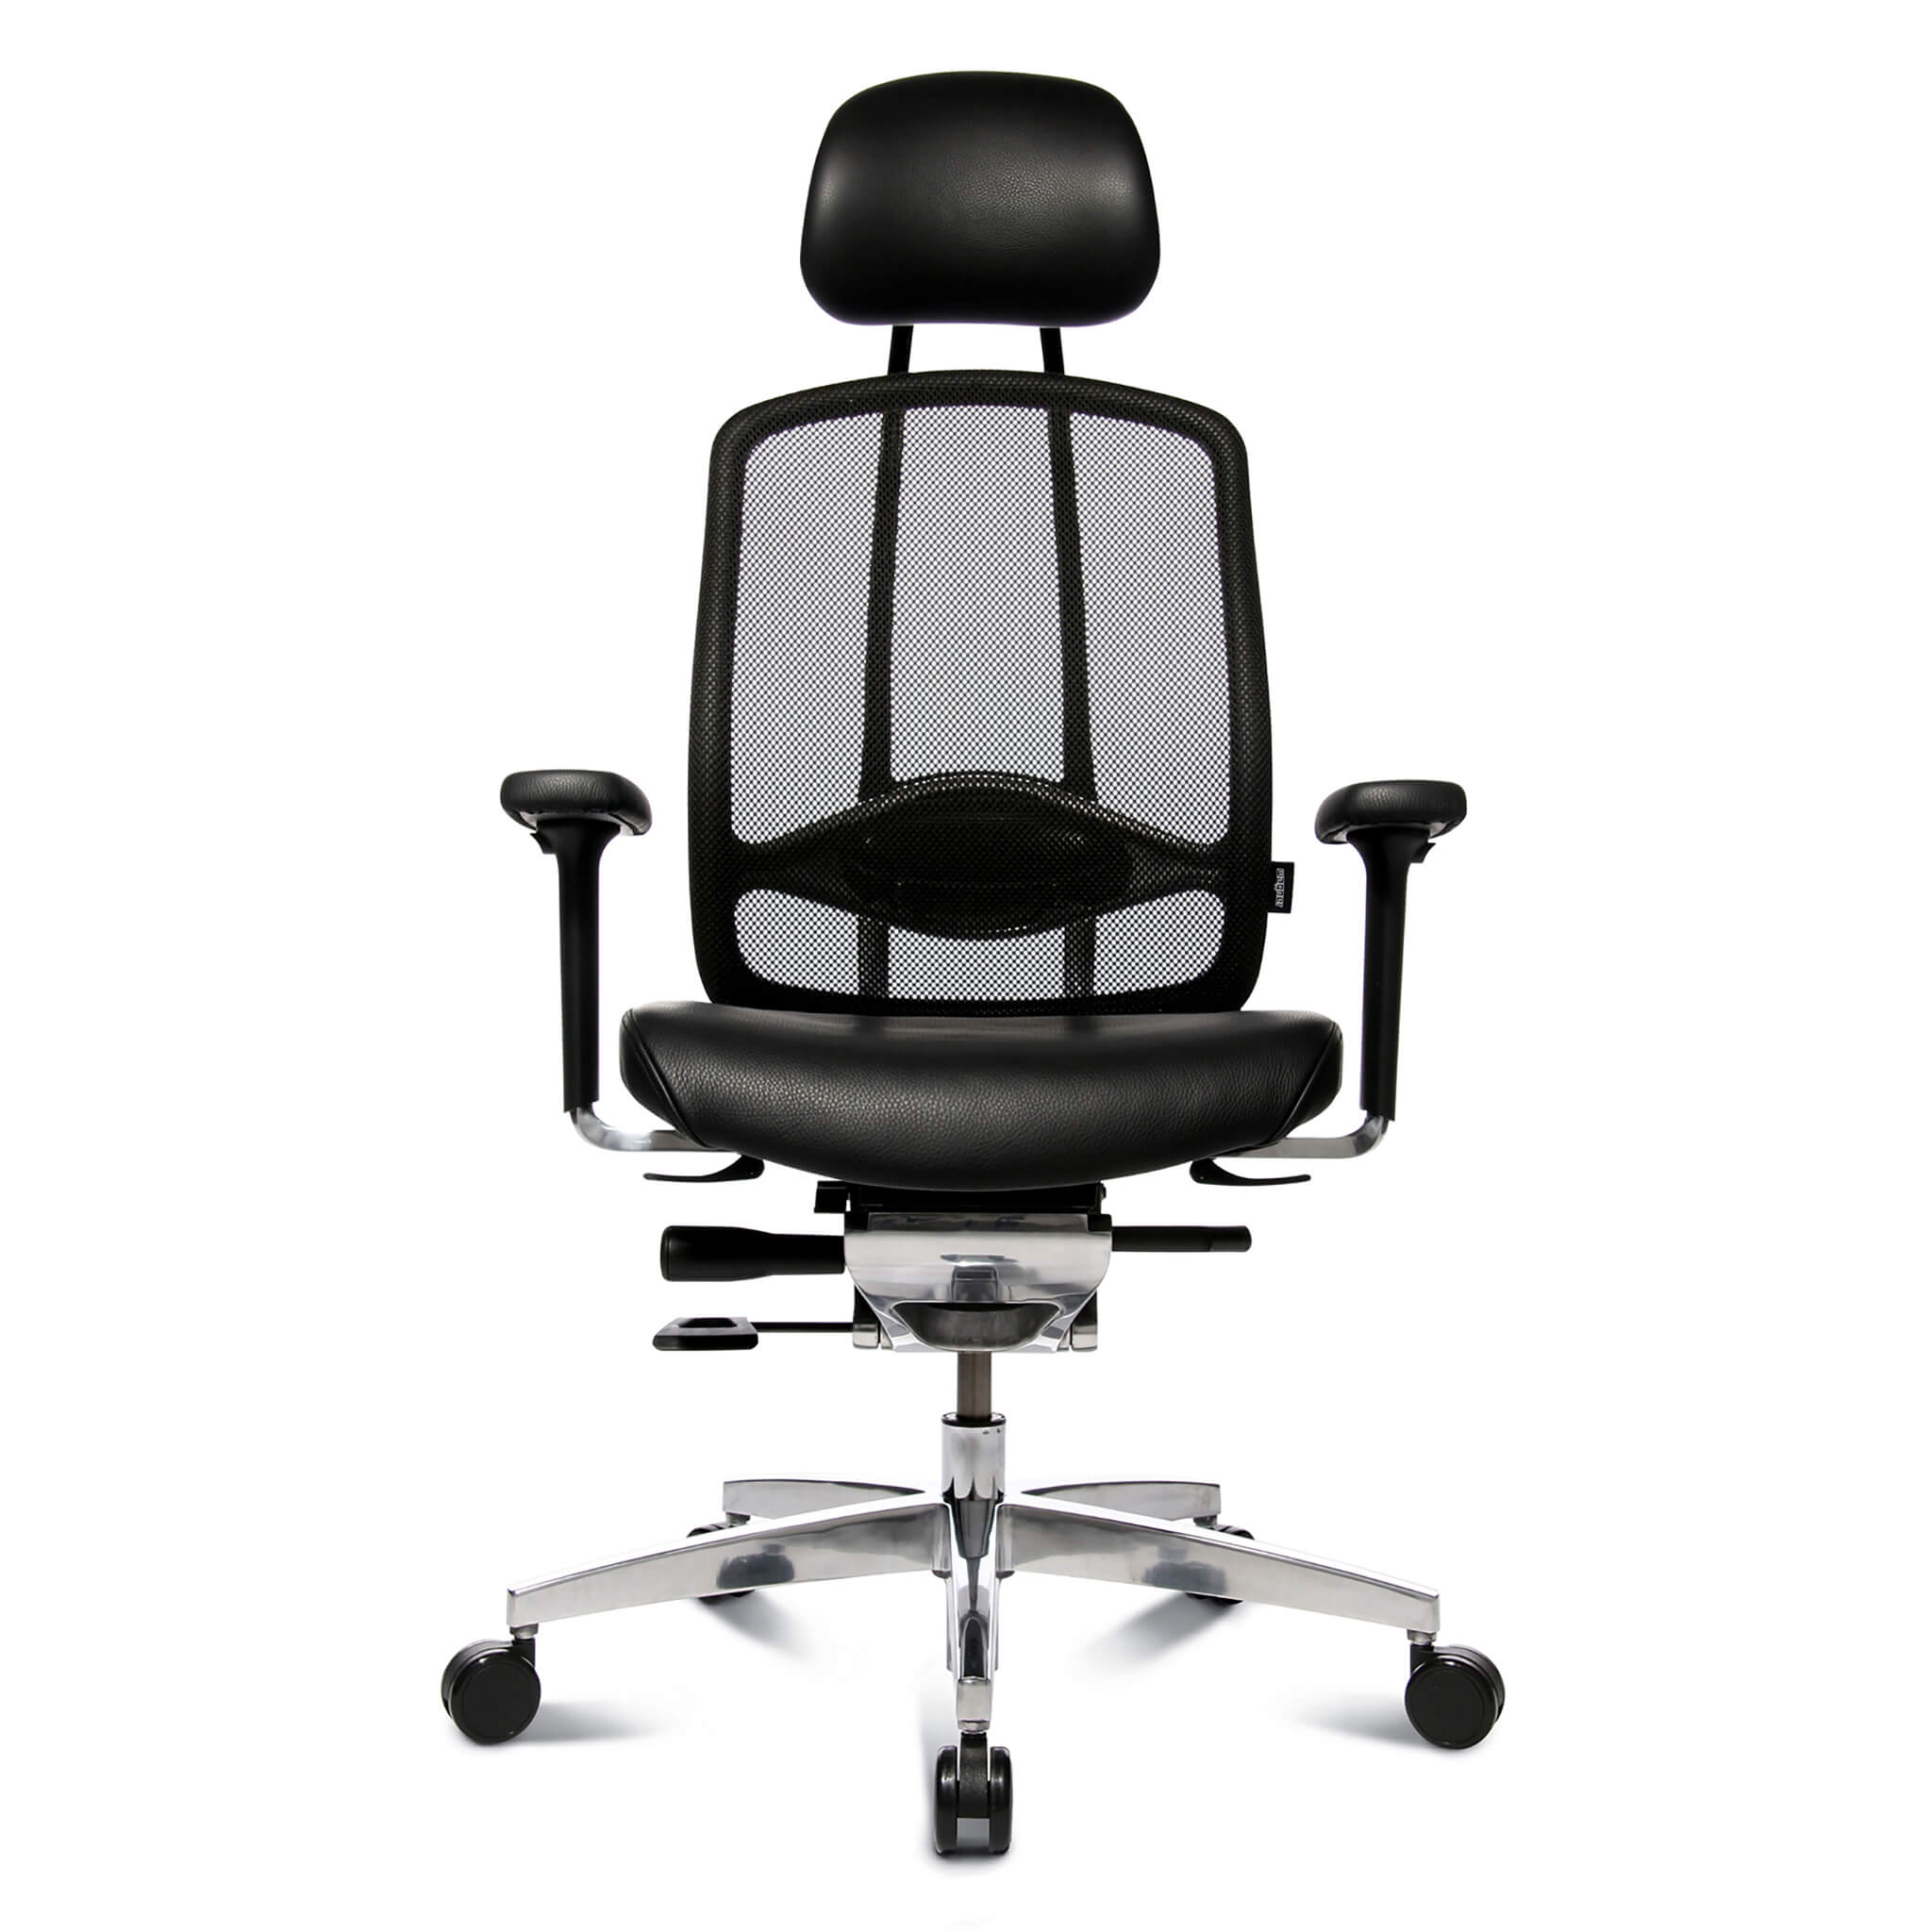 Wagner AluMedic Limited Bürostuhl mit Lederbezug und Kopfstütze